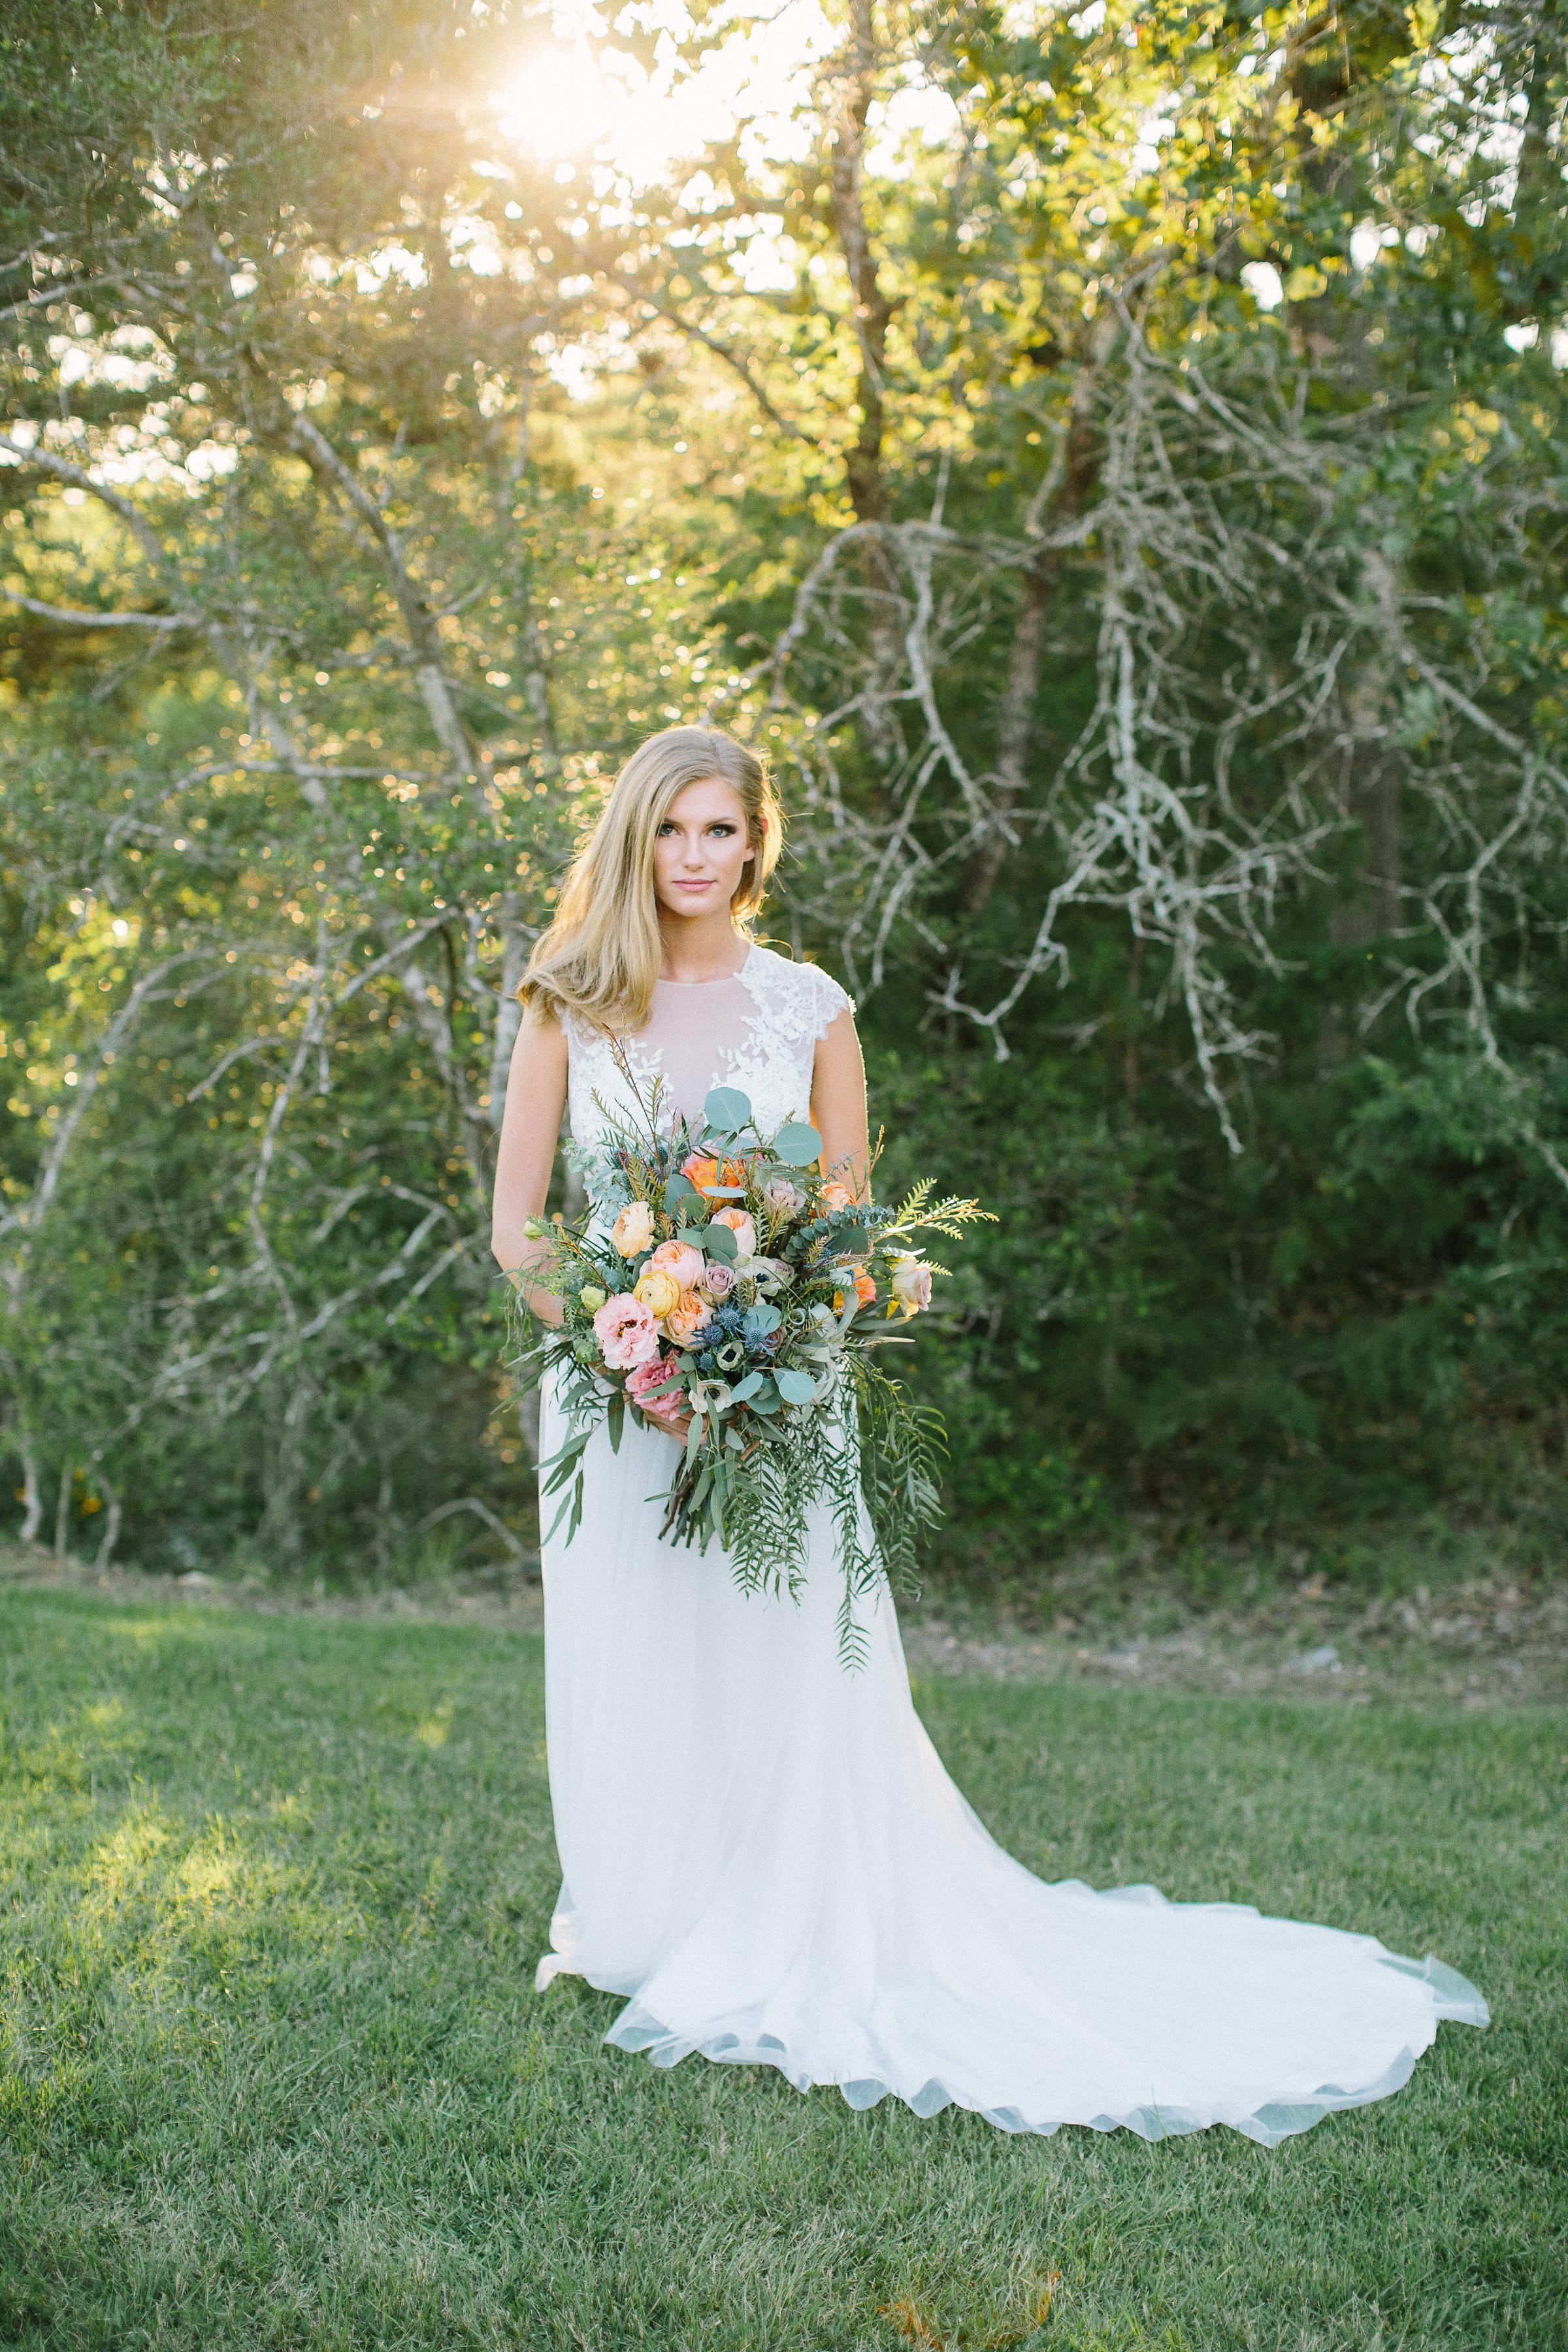 Ellen-Ashton-Photography-Peach-Creek-Ranch-Weddings-Wed-and-Prosper280